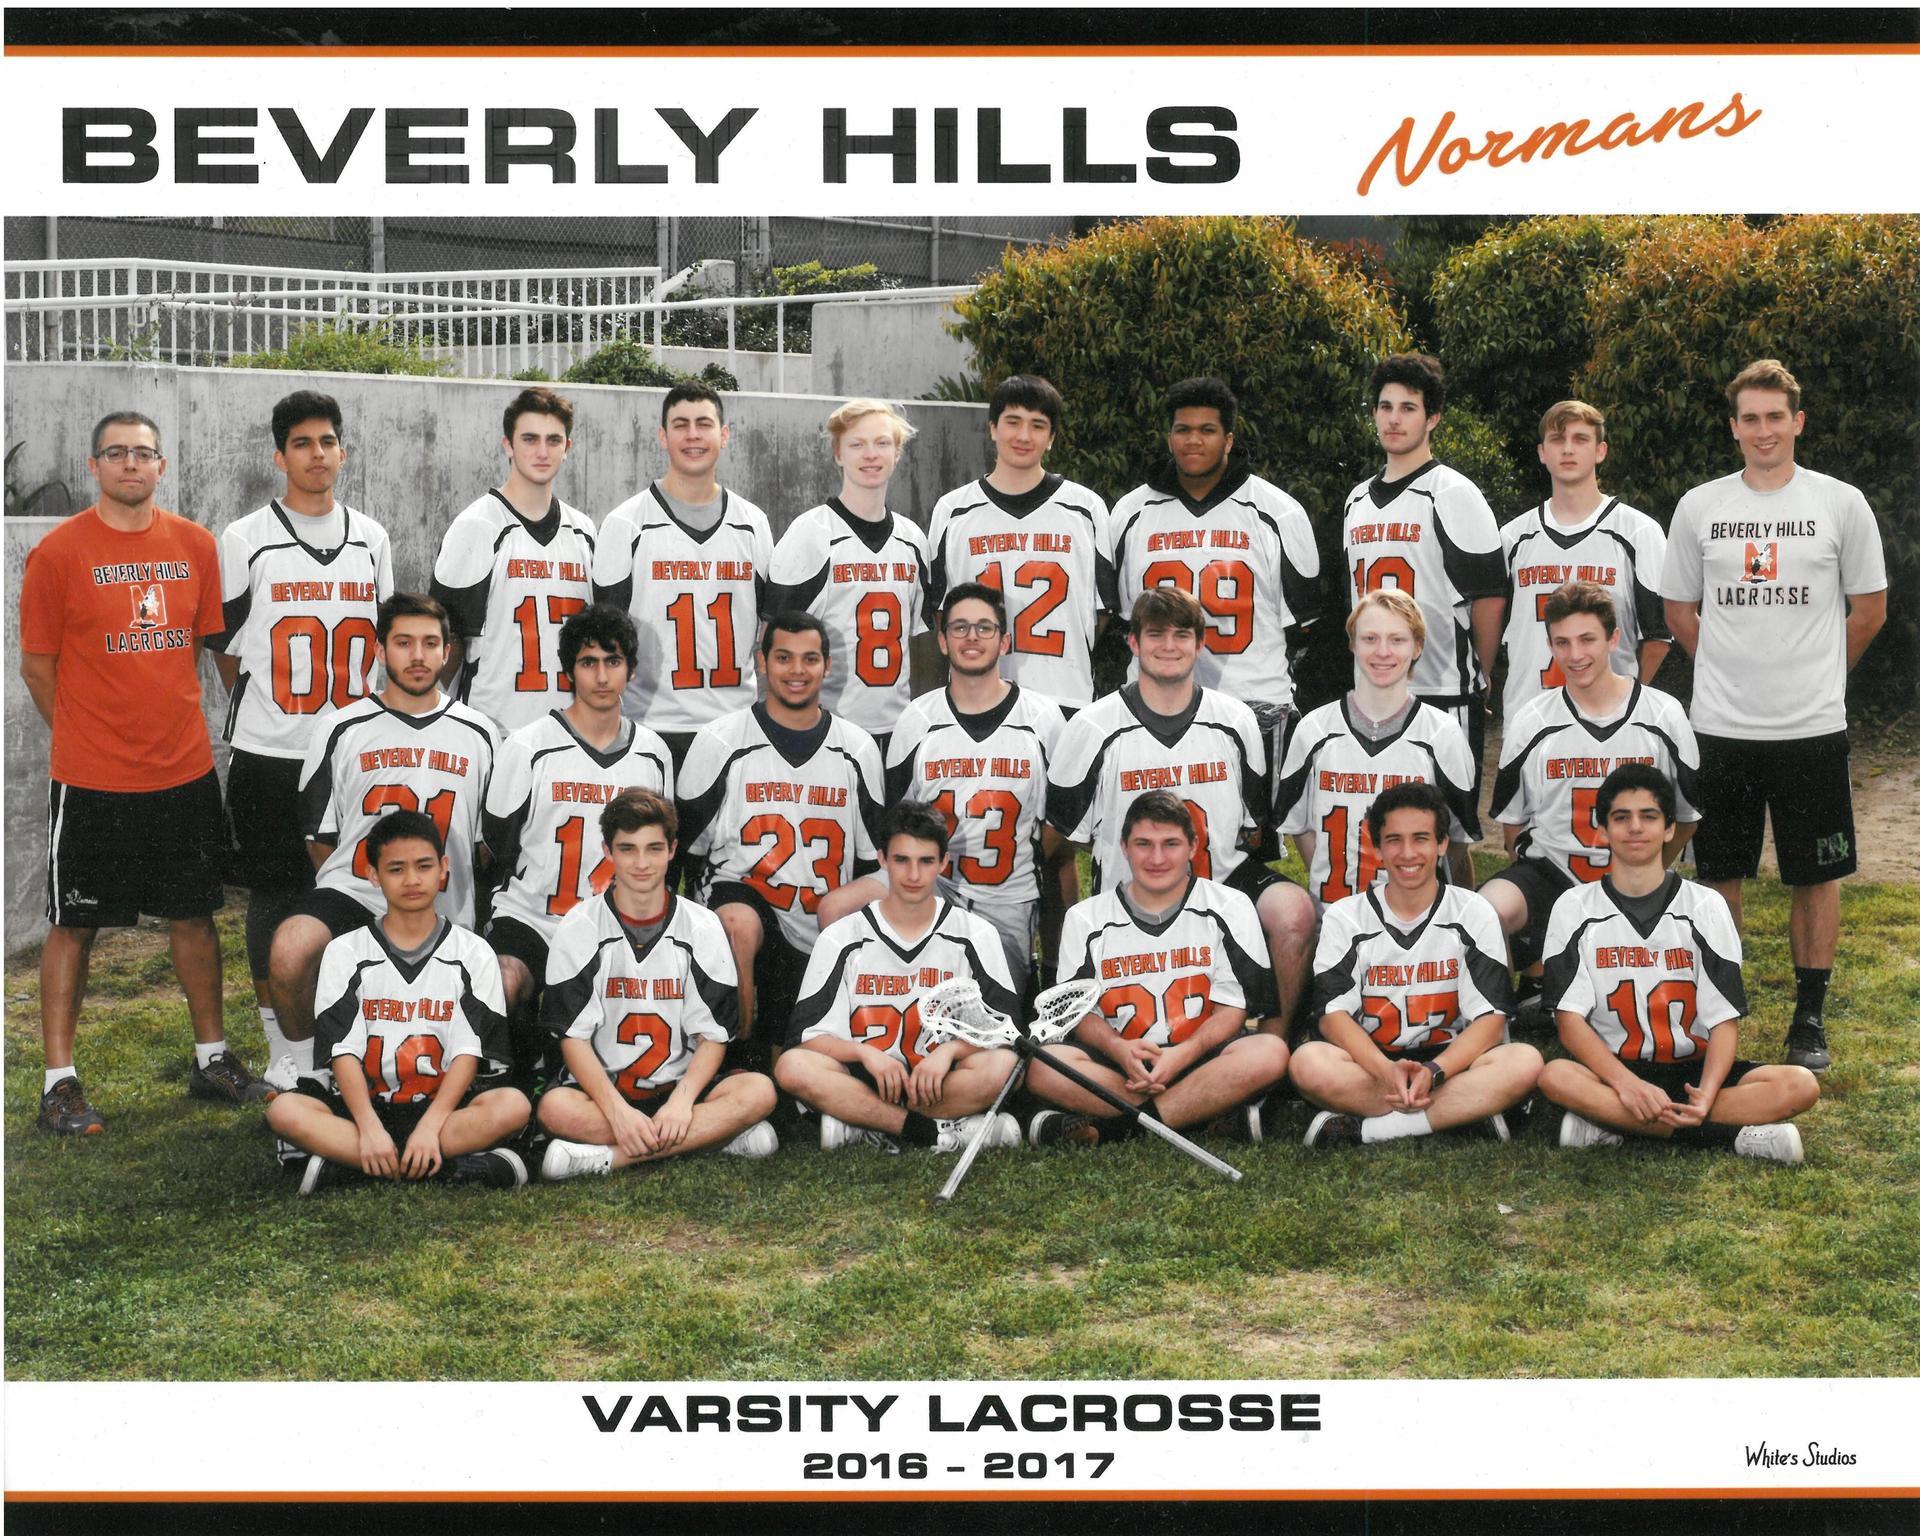 2017 Varsity Lacrosse